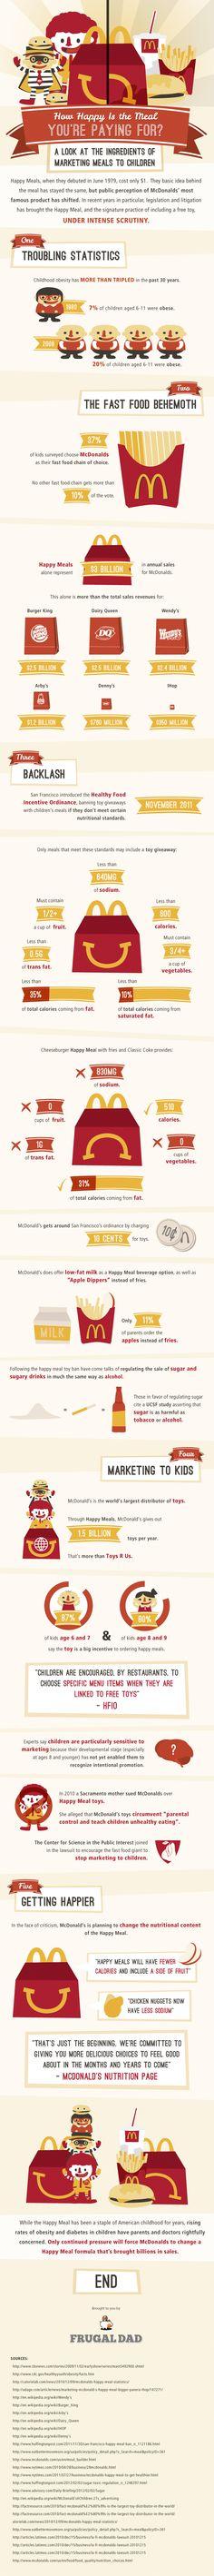 Ugh. McDonald's is poison.